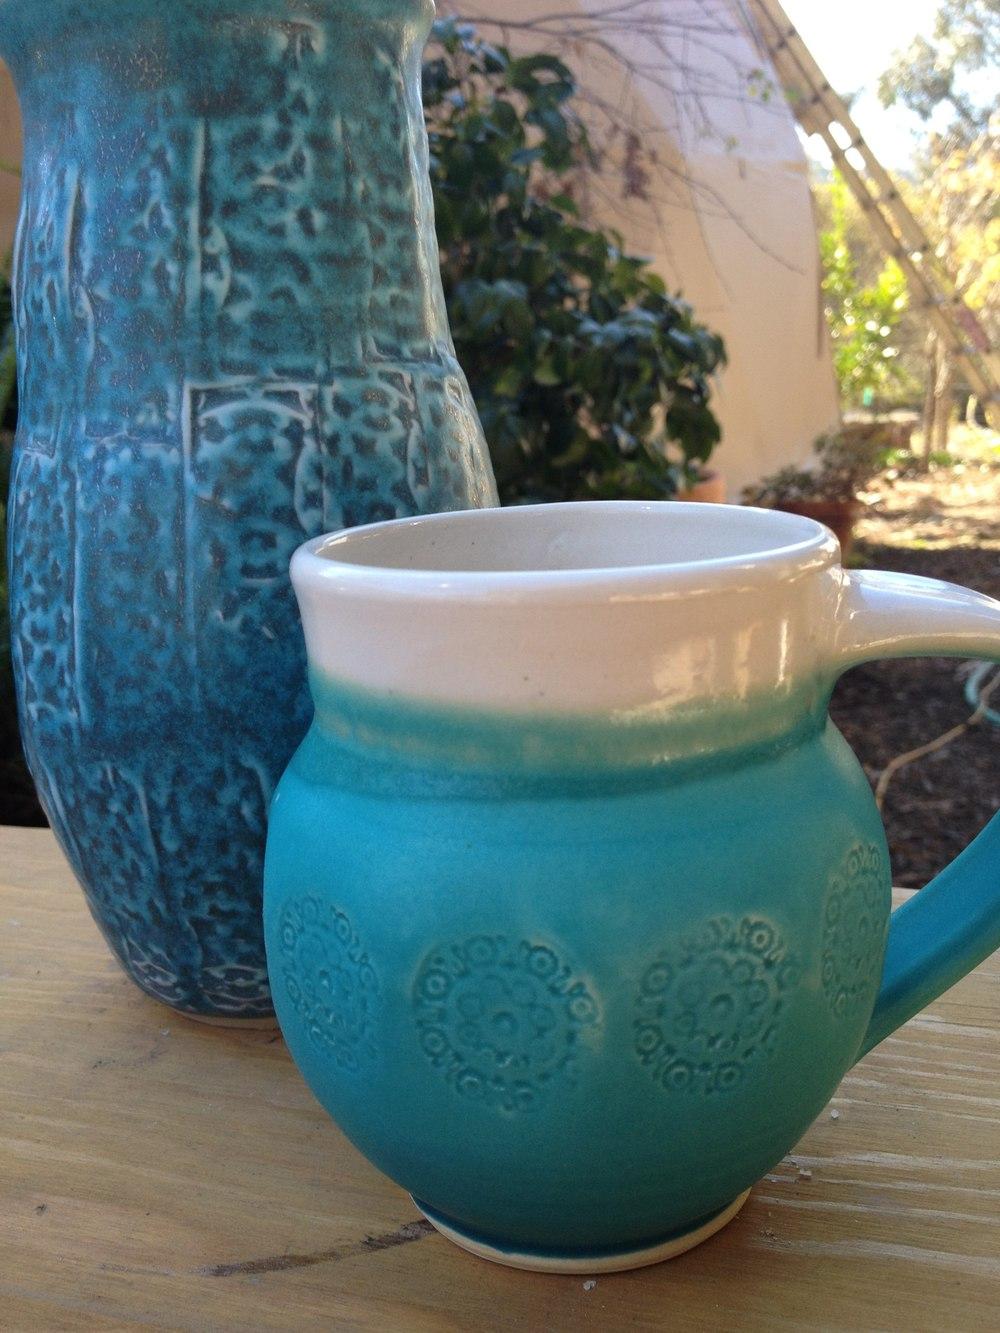 Indo-inspired vase & mug